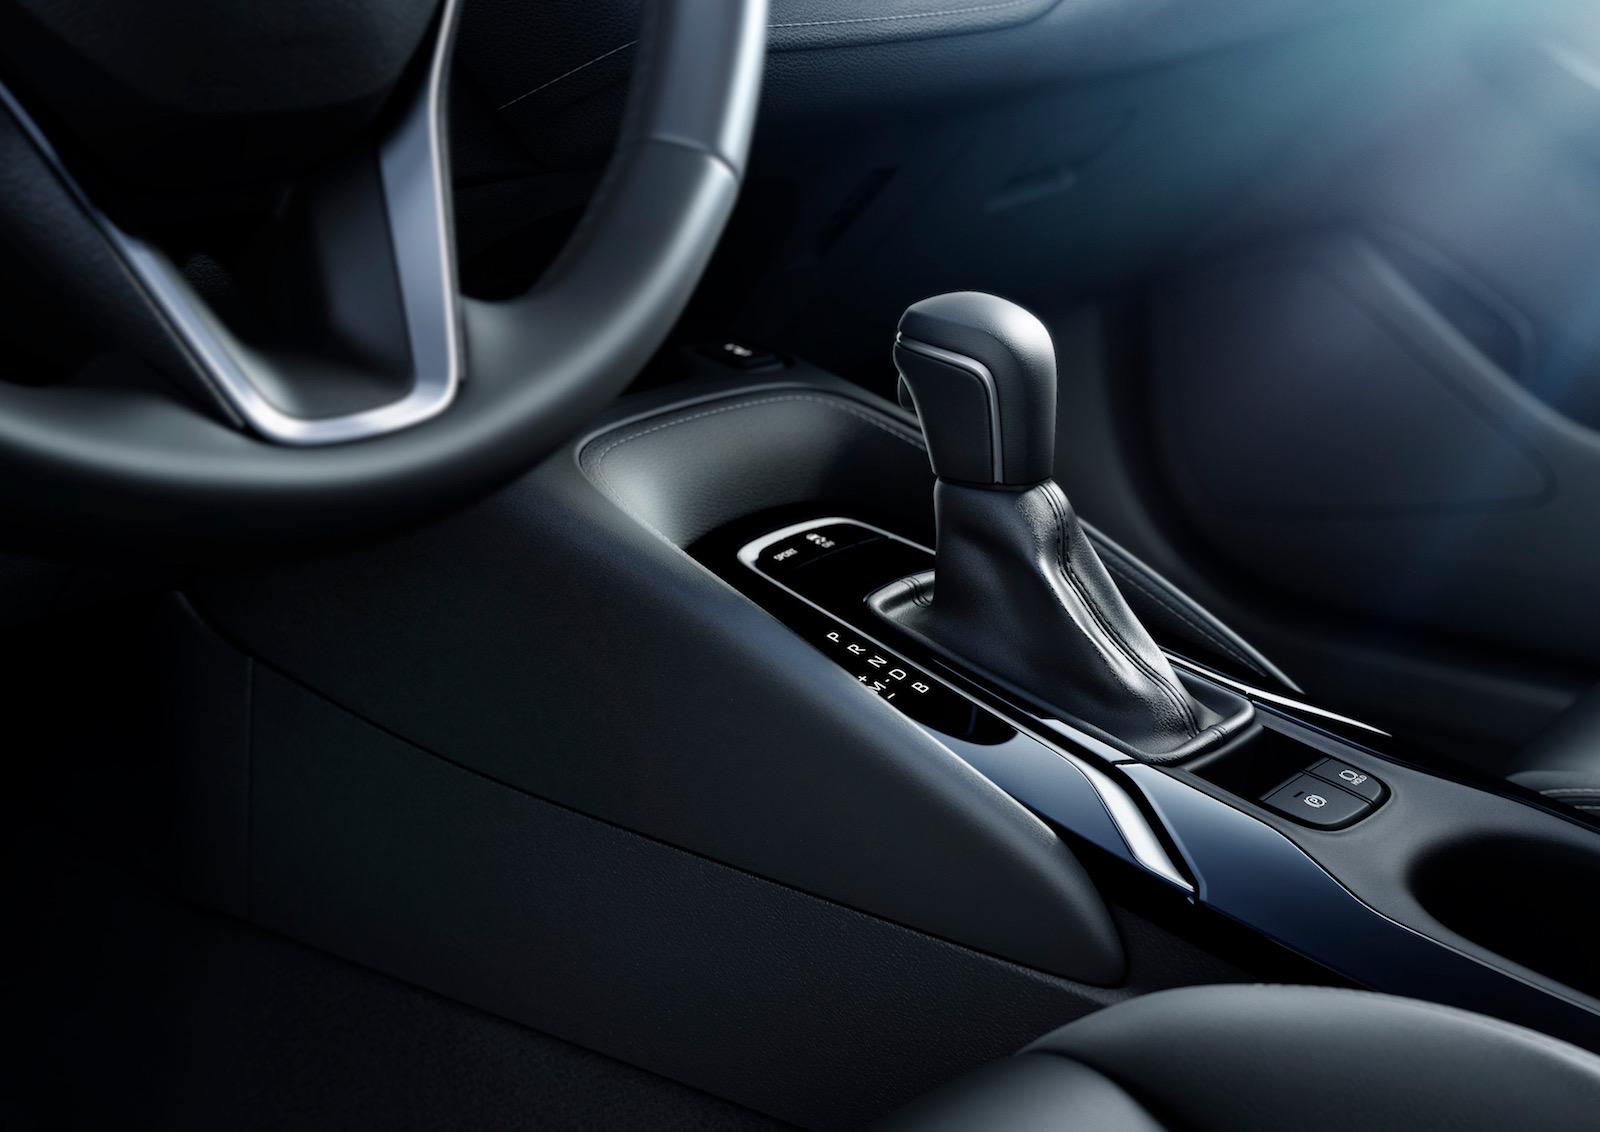 2019 Toyota Corolla Initial Australian Specs Confirmed Schematic Manual